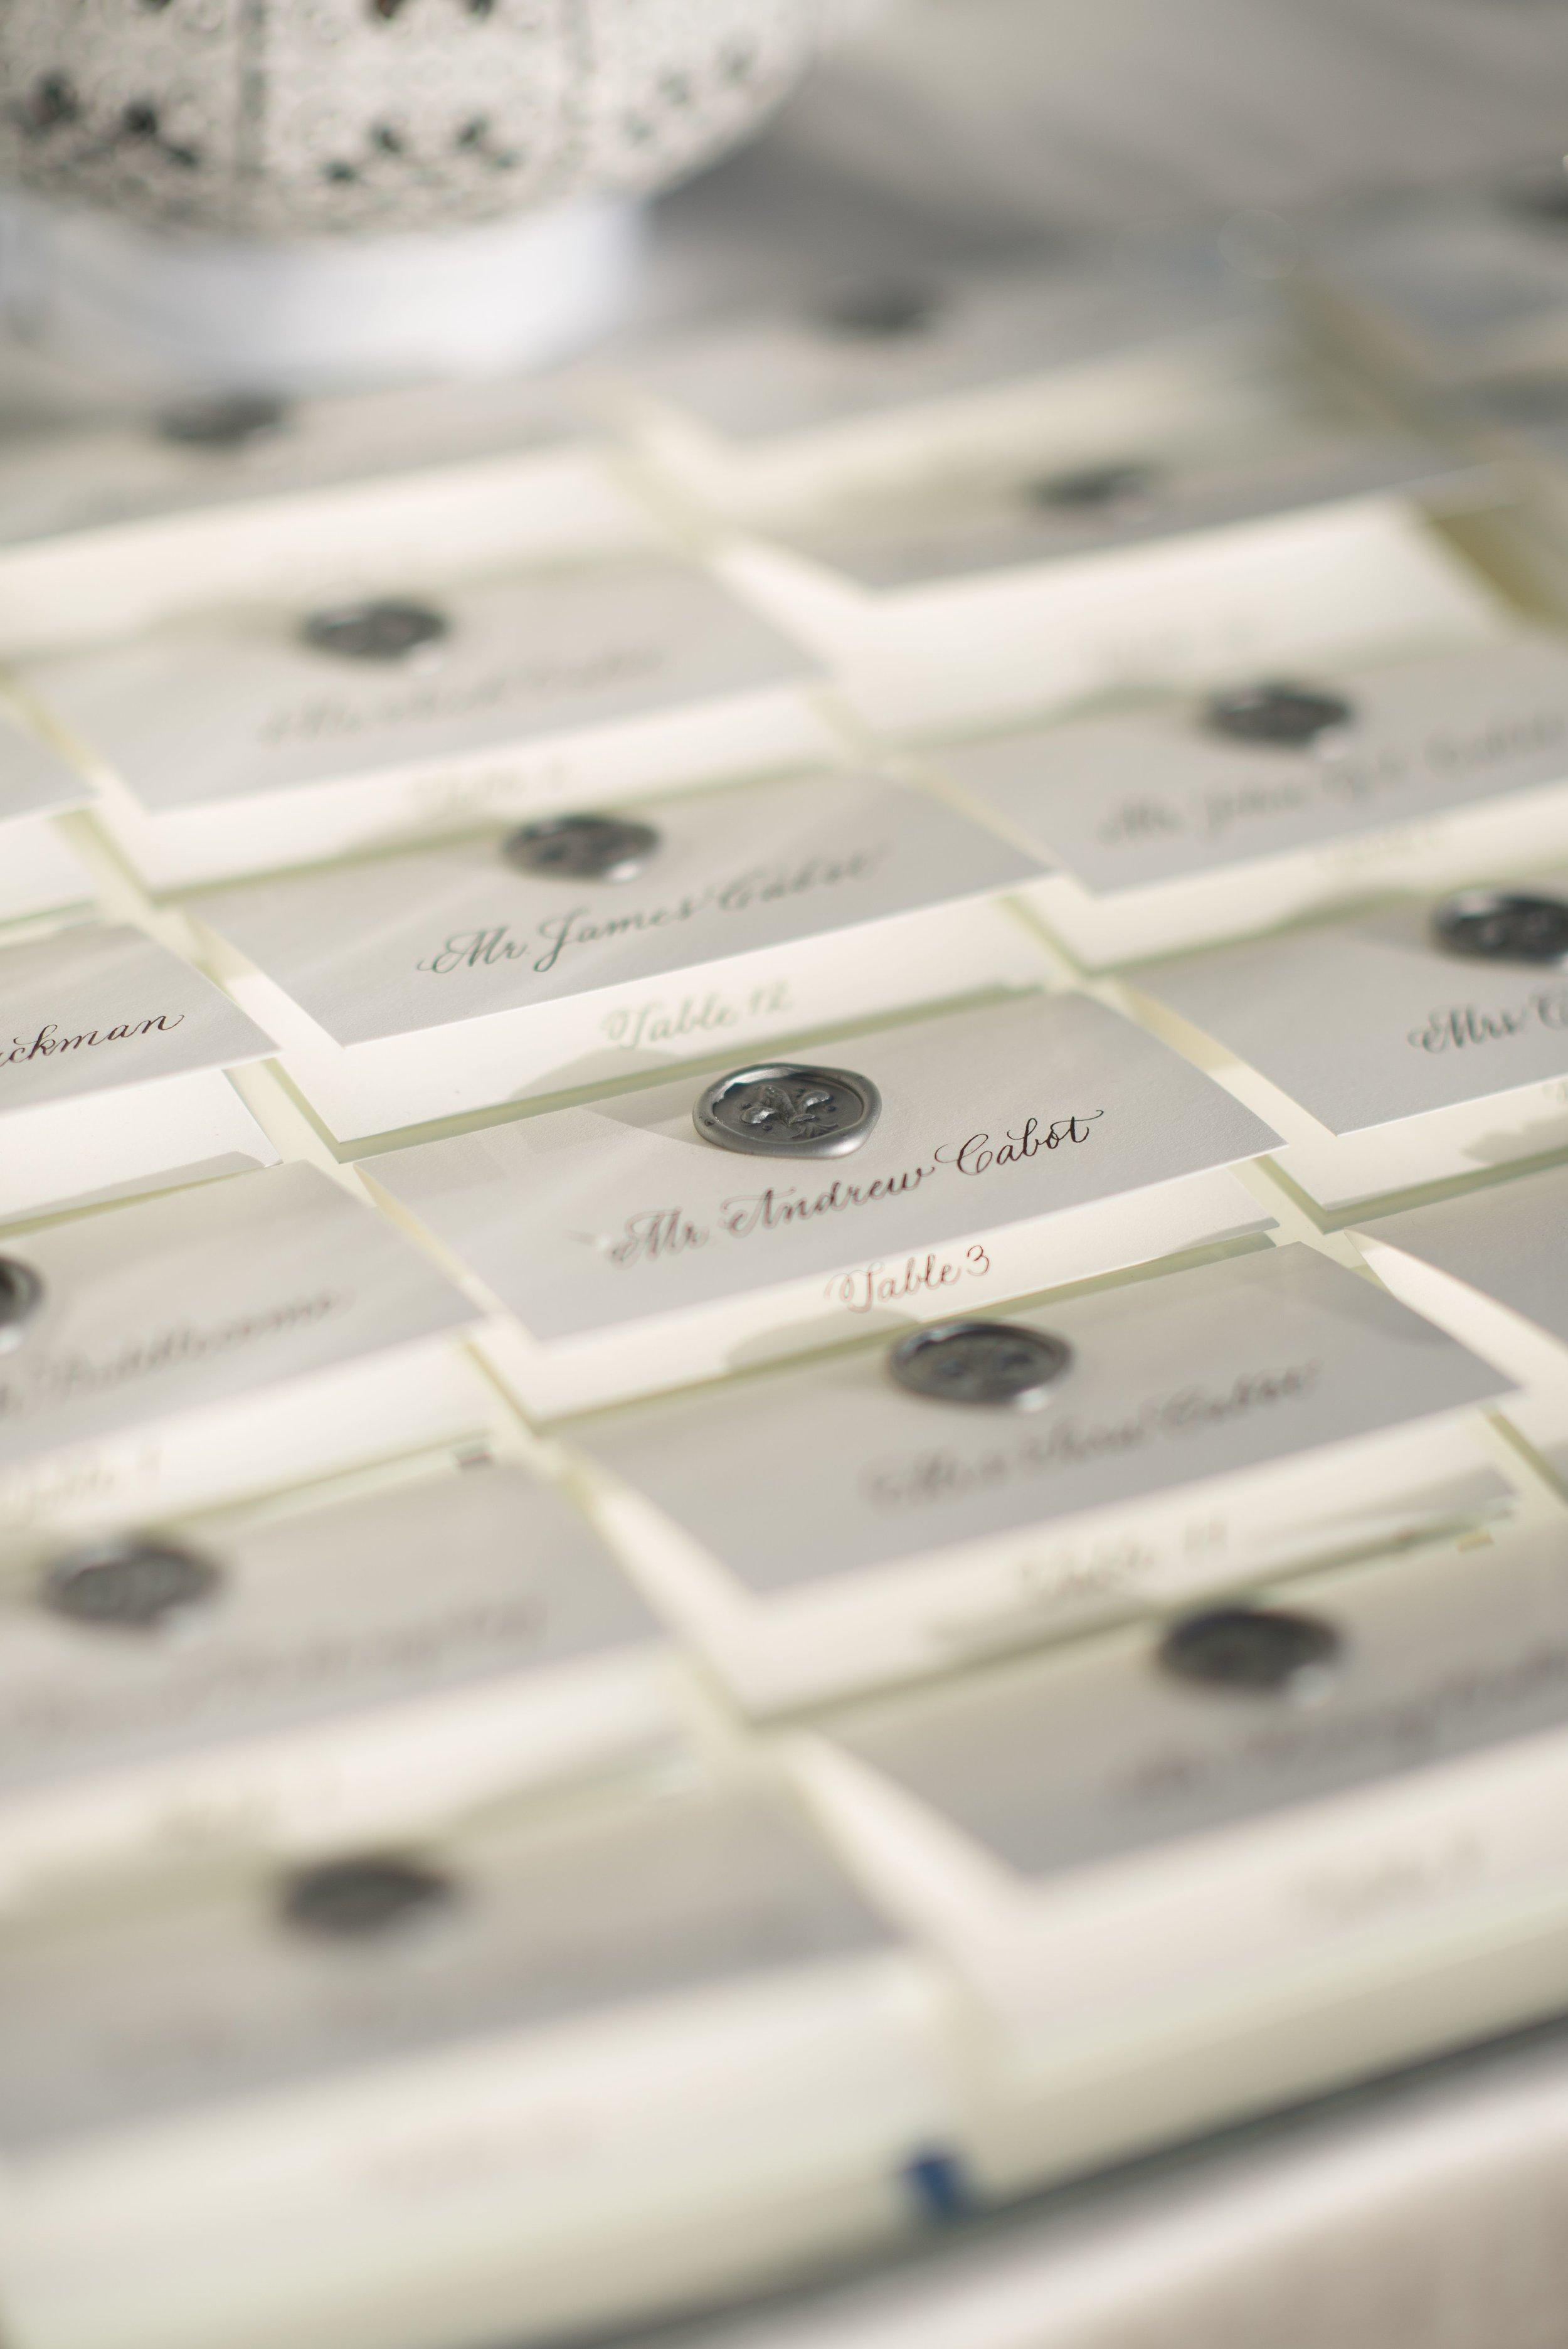 www.santabarbarawedding.com | Nate & Jenny Weddings | Four Seasons Resort The Biltmore | Ann Johnson Events | La Tavola | Wedding Escort Cards